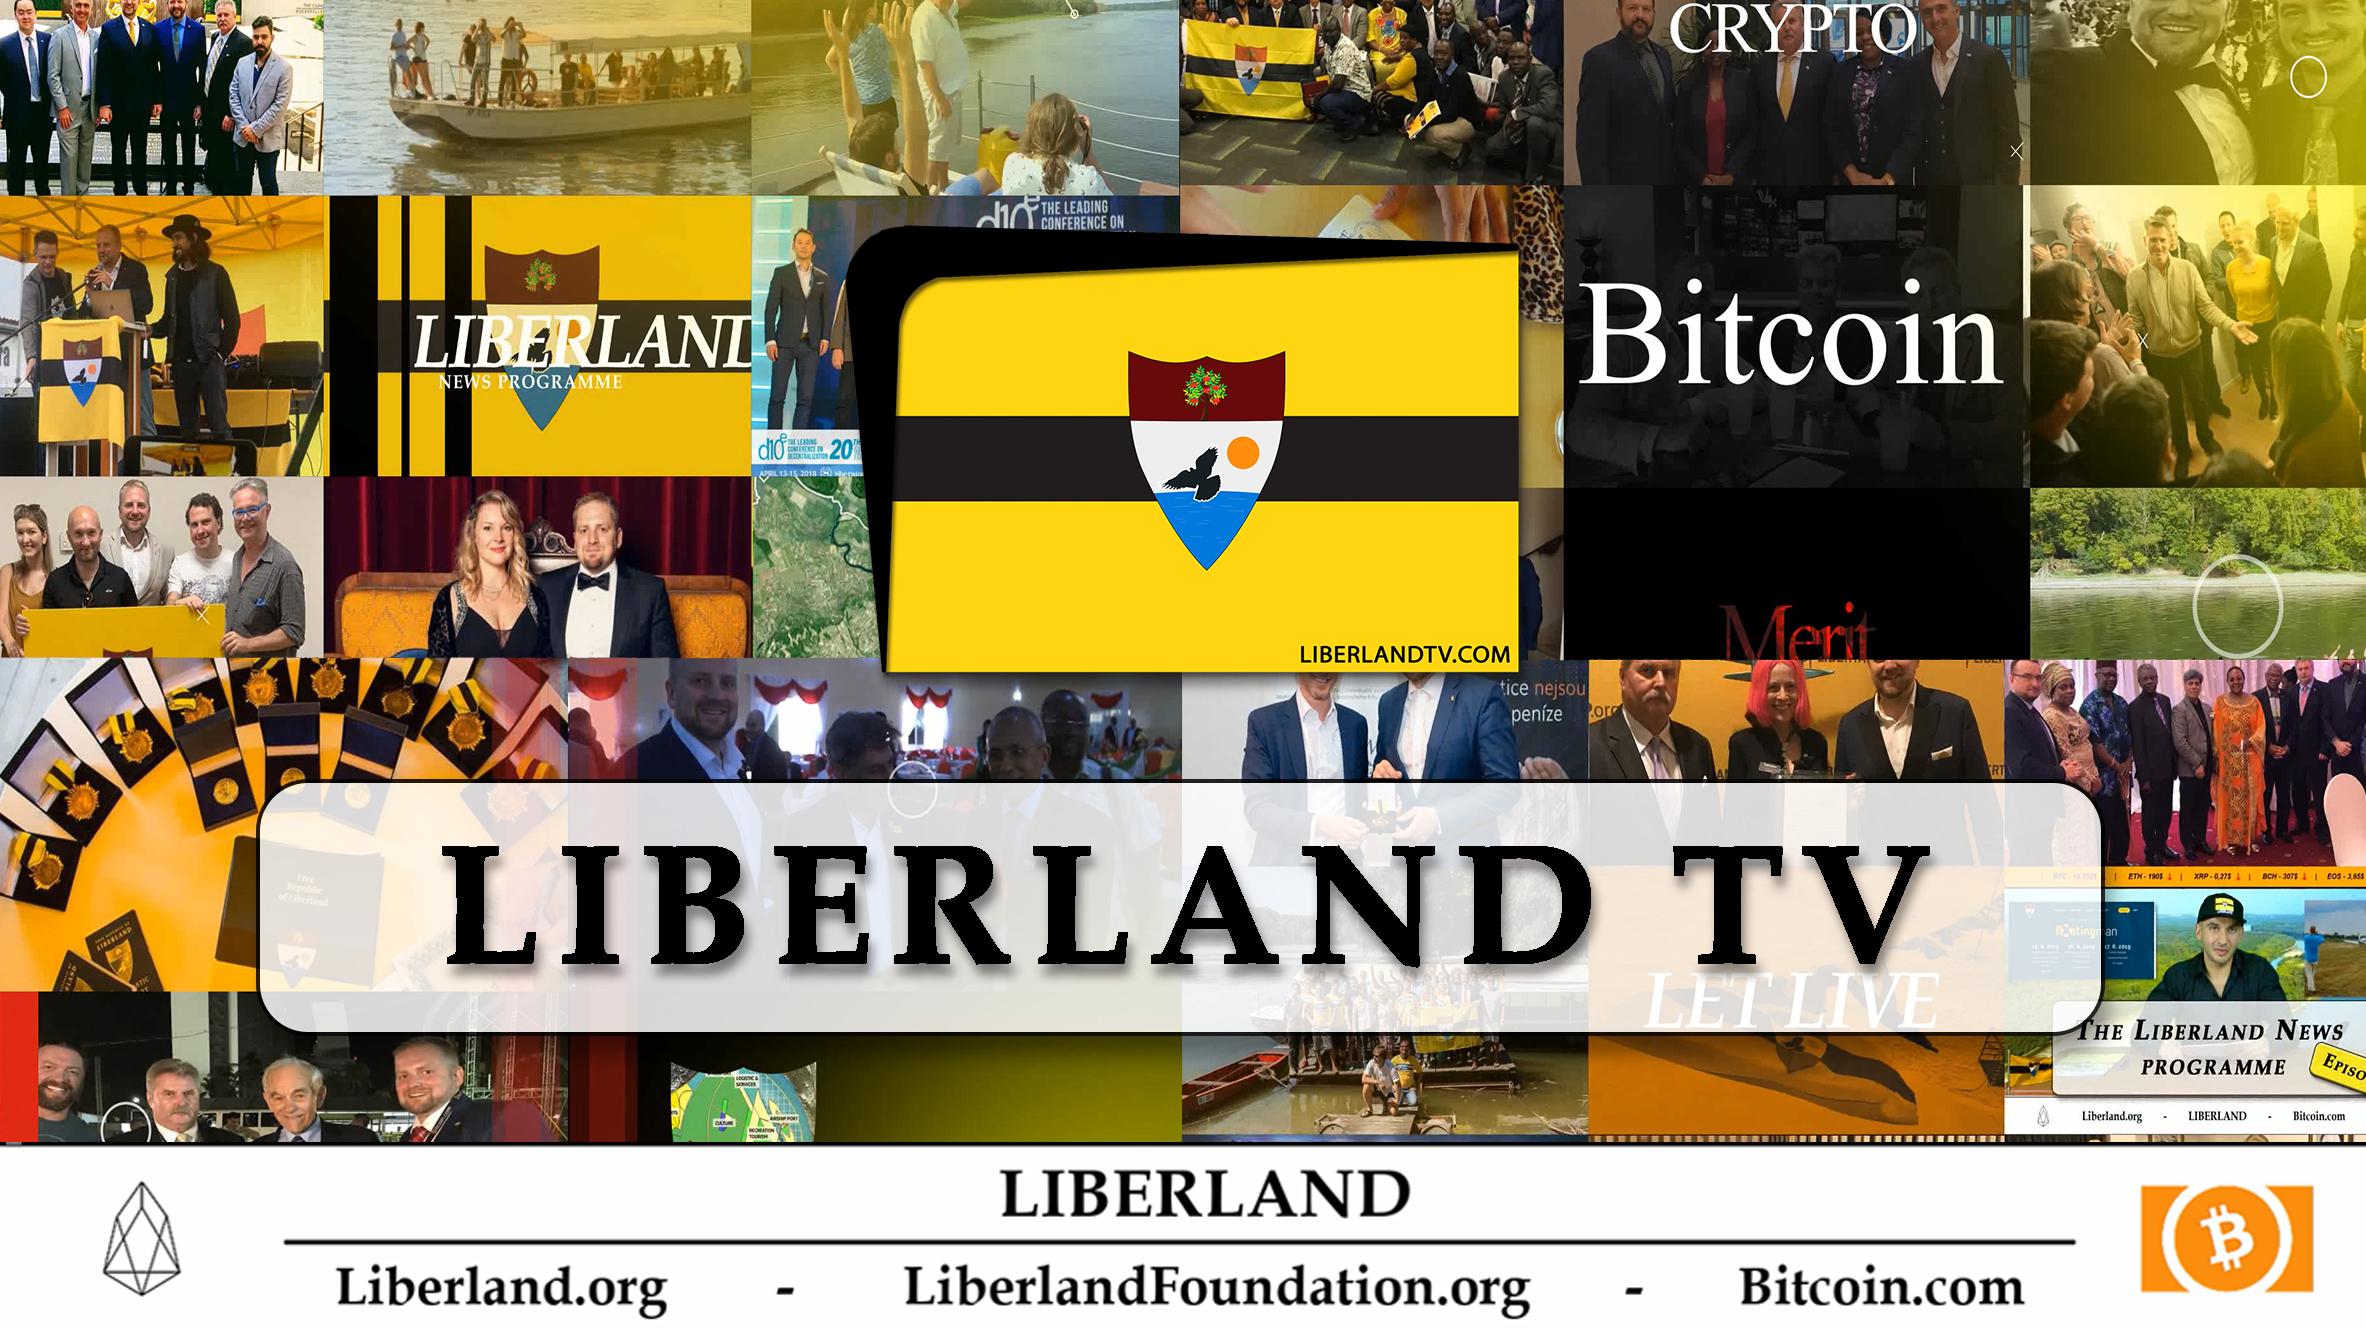 Liberland New Programme News Brochure Tv Free Republic of Liberland Libertarian bitcoin freedom liberty